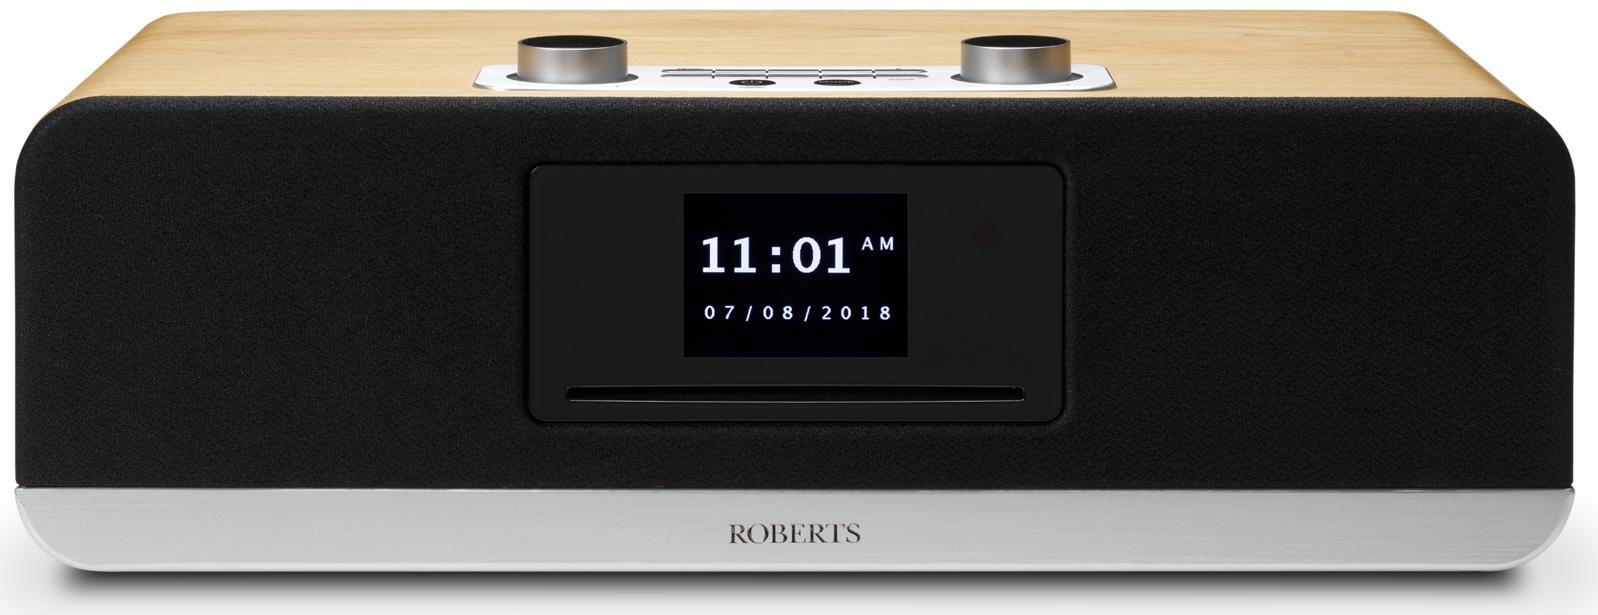 Roberts Radio integrerad mikro